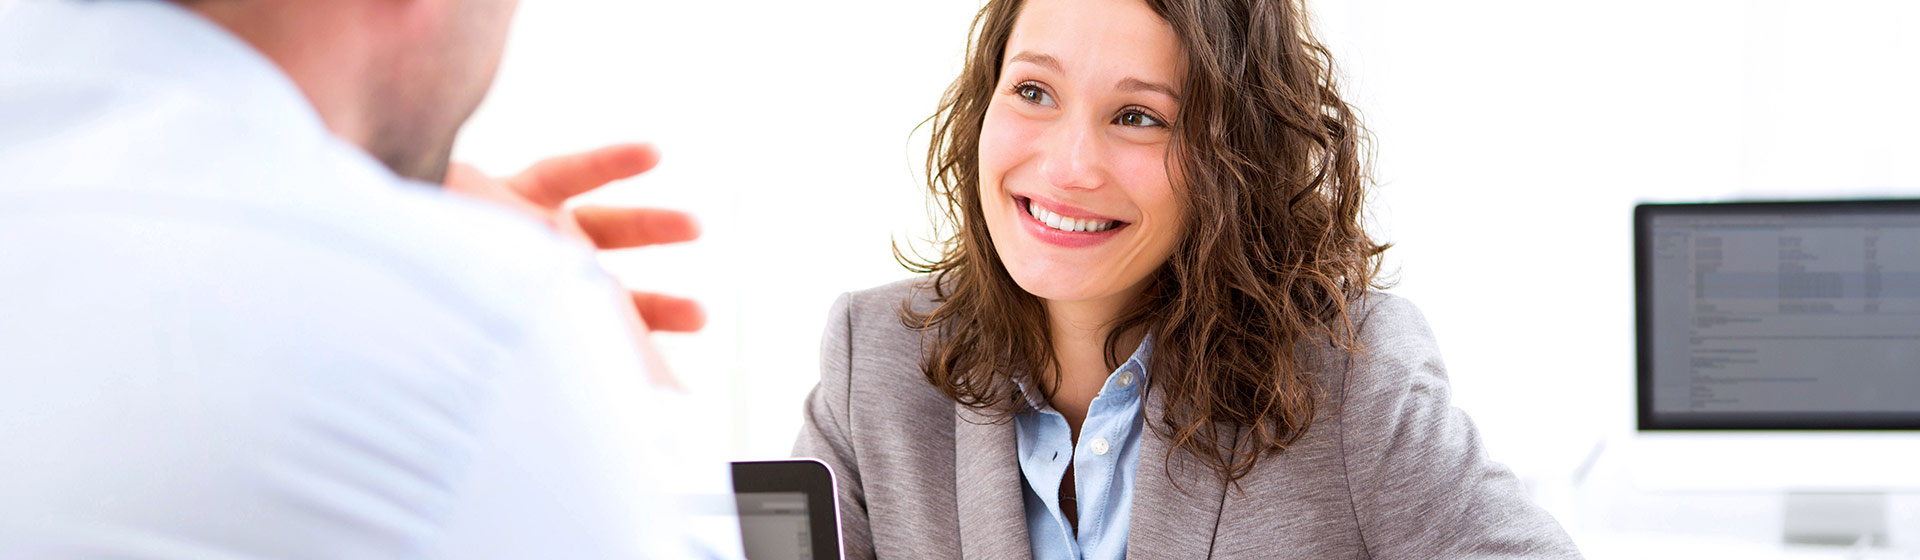 Comnicia business school en ligne, une super alternative